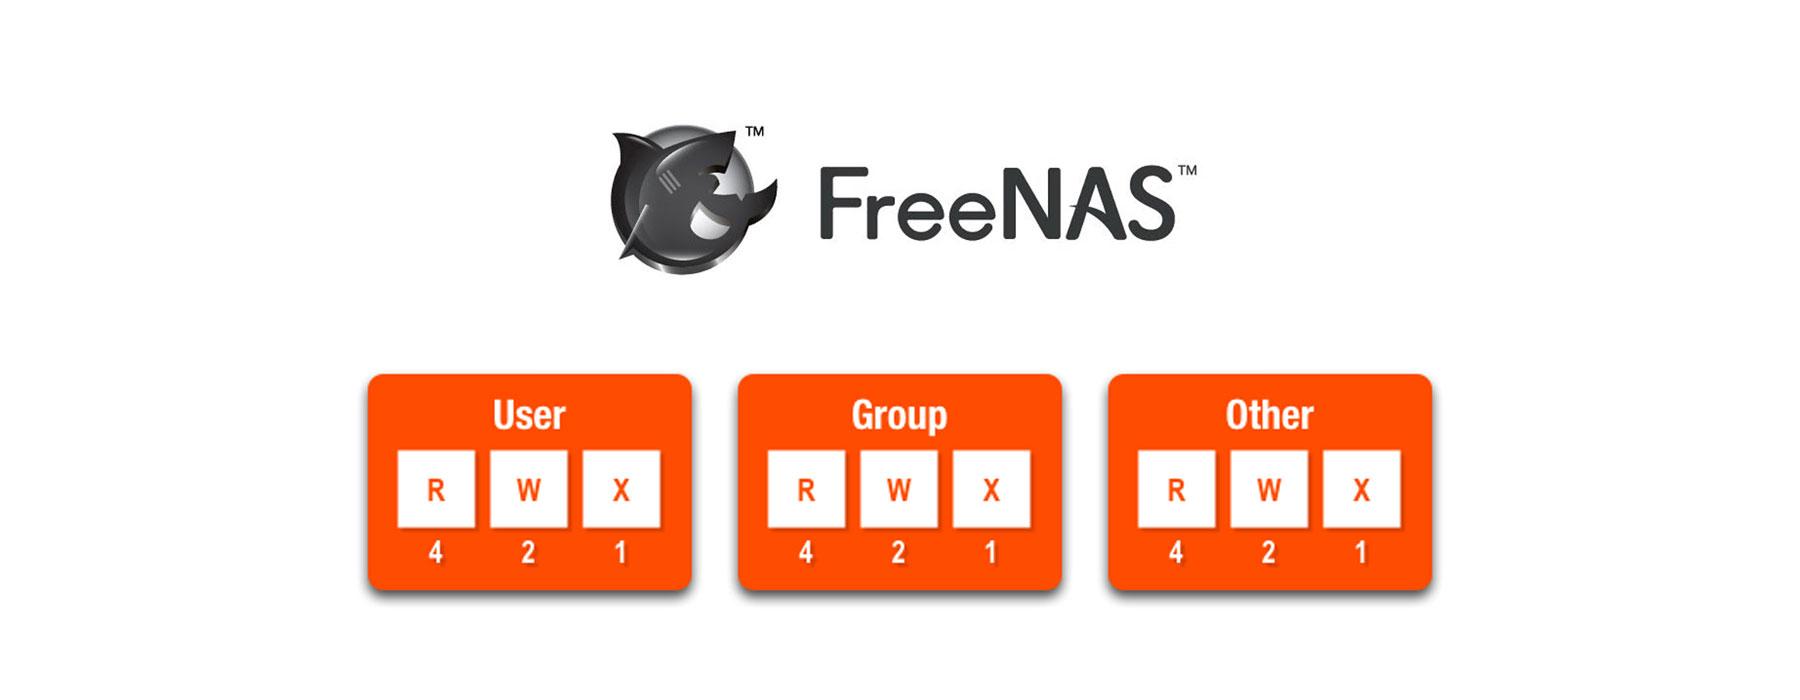 Creating permissions & users on FreeNAS